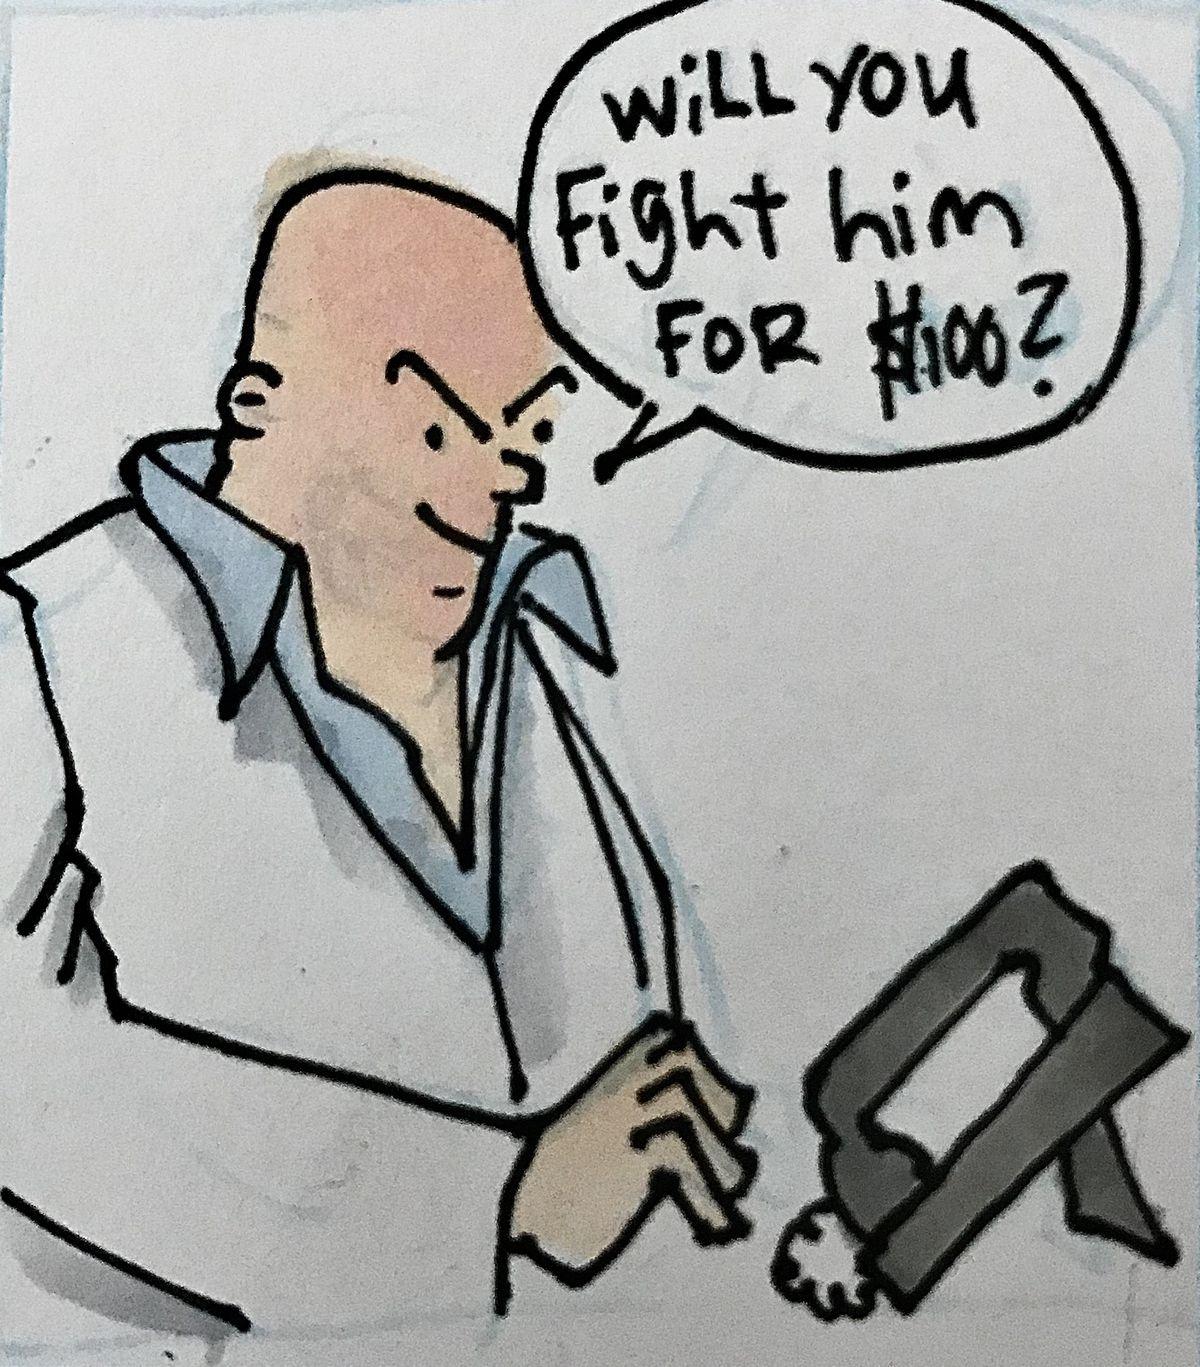 Chris Rini, MMA Squared, Khabib Nurmagomedov, Conor McGregor, Khabib vs Conor, 100 Million MMA, Dana White,